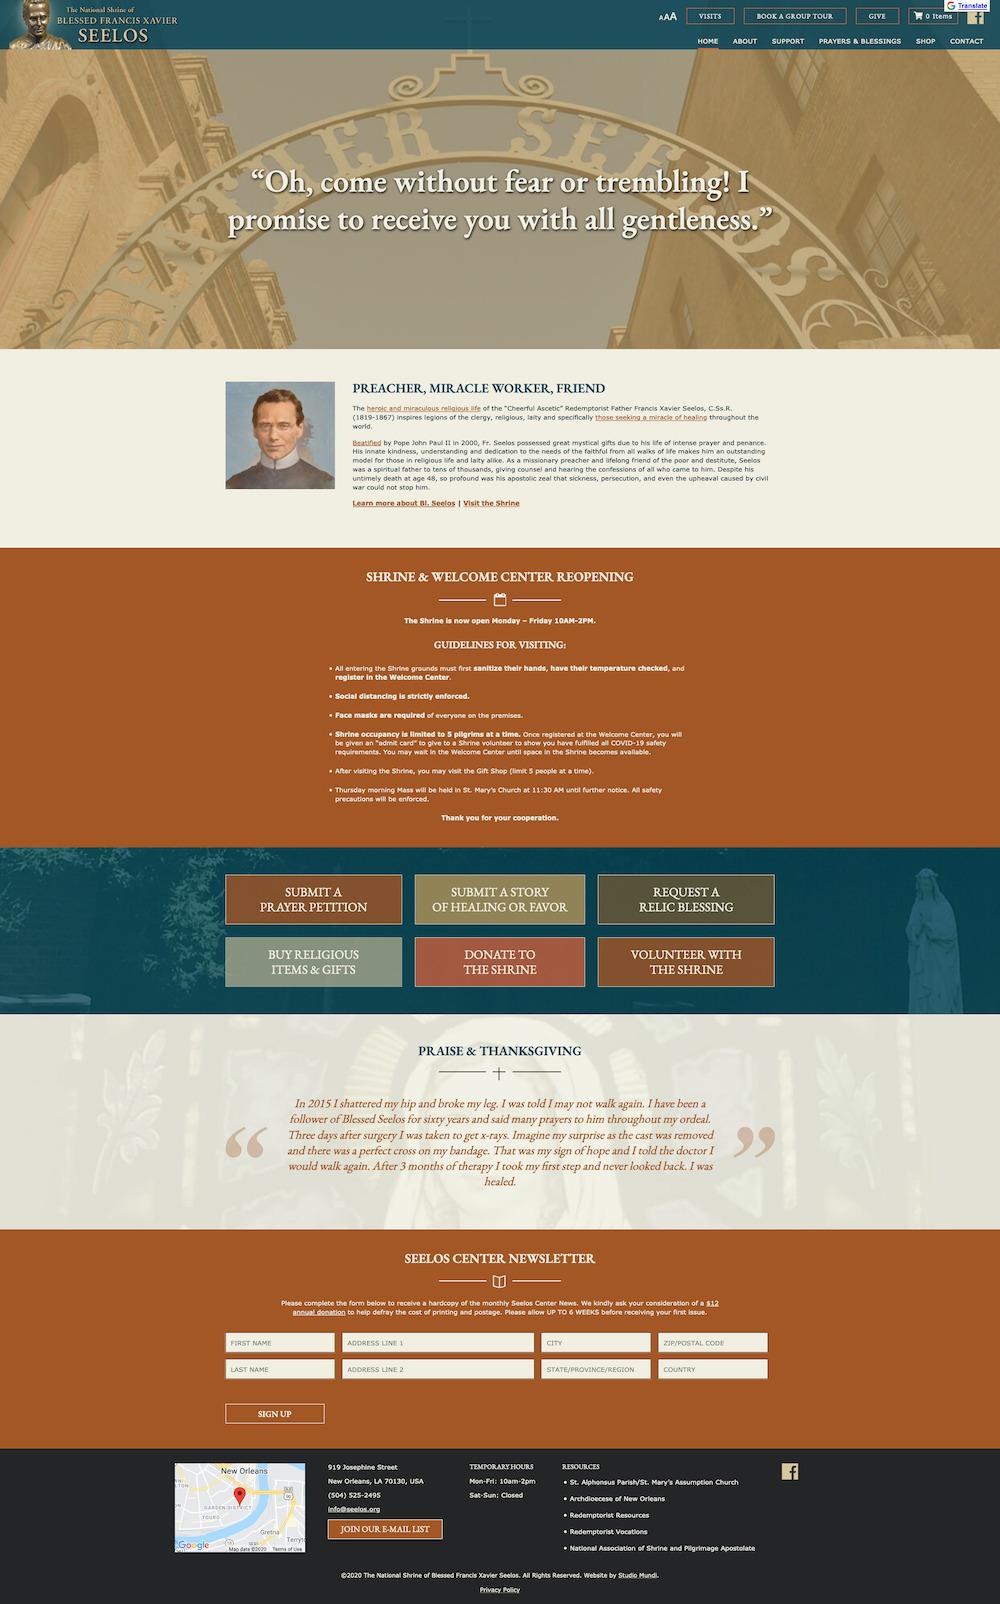 Screenshot of seelos center website homepage